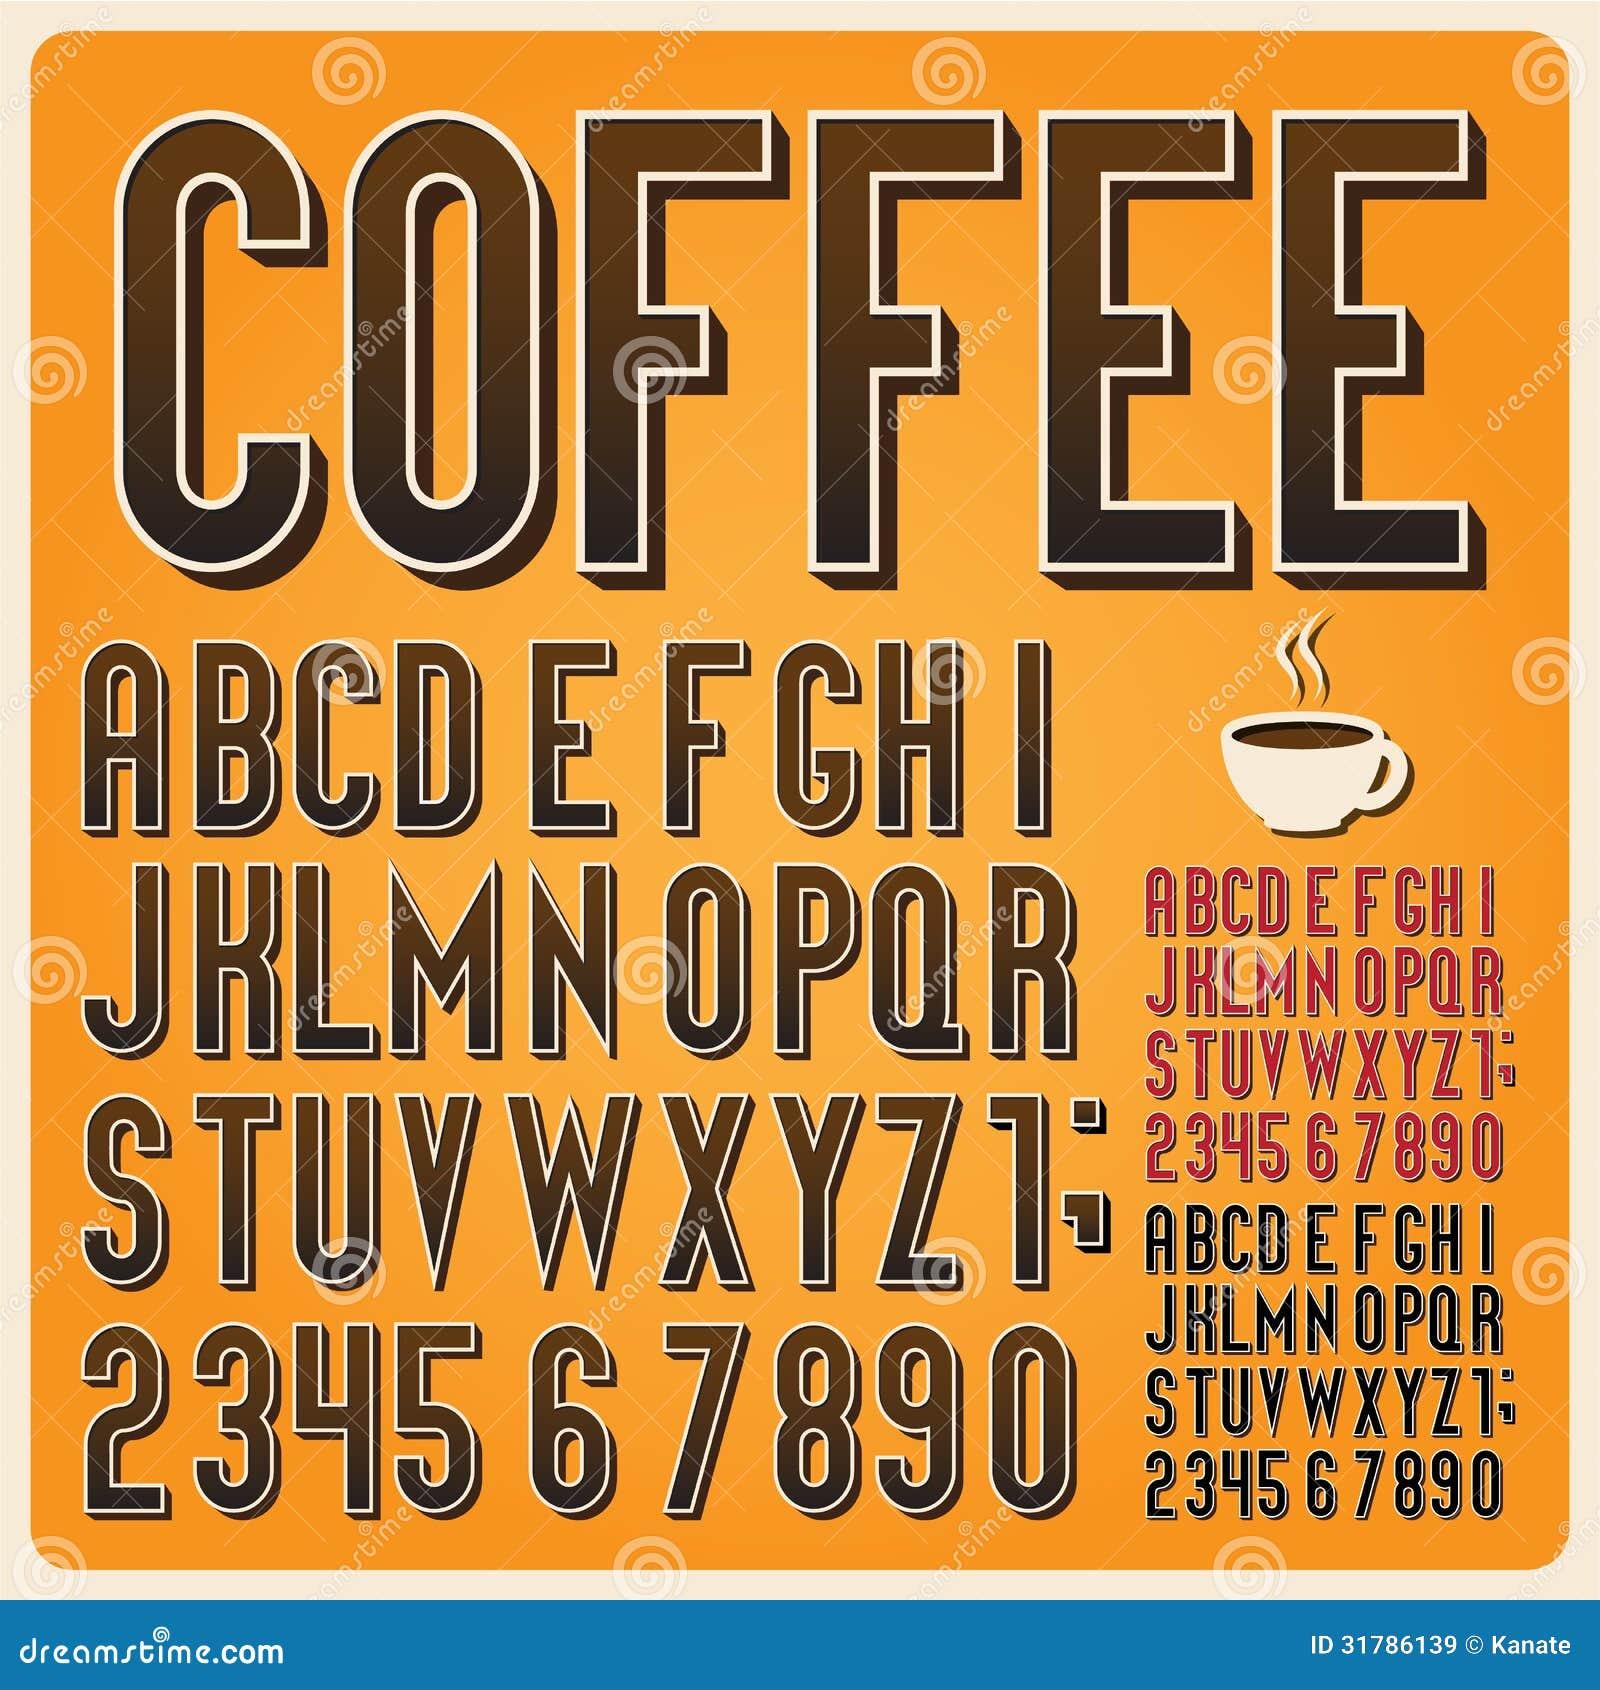 Retro Type Font Vintage Typography Royalty Free Stock